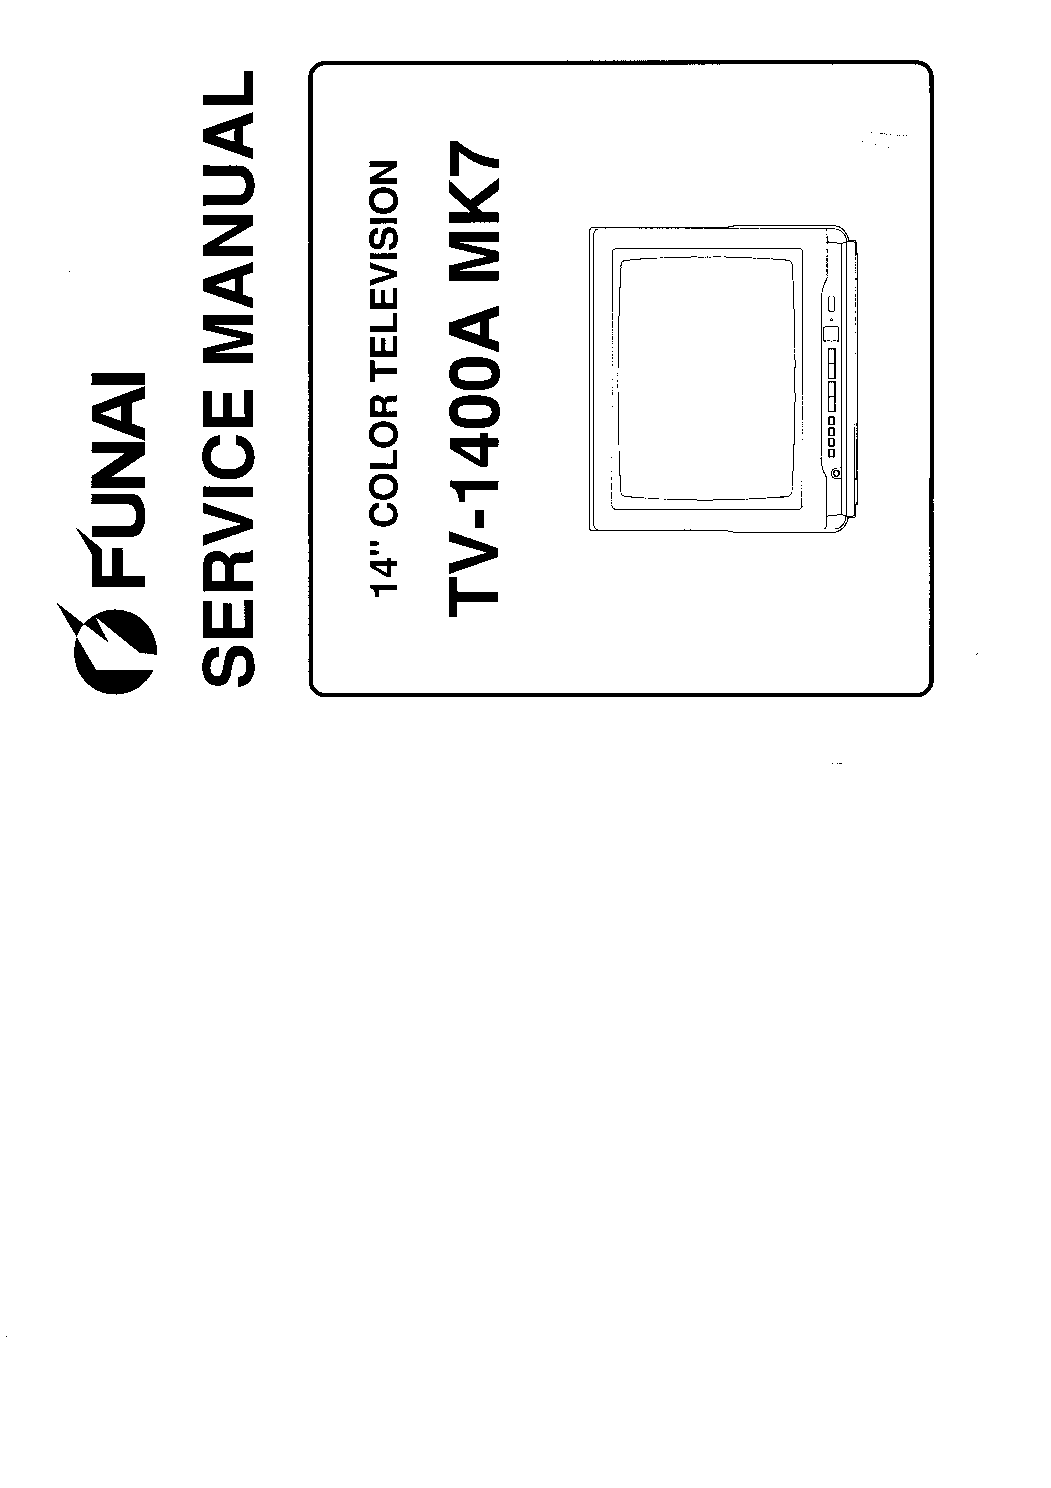 h схему funai tv 2100a mk7